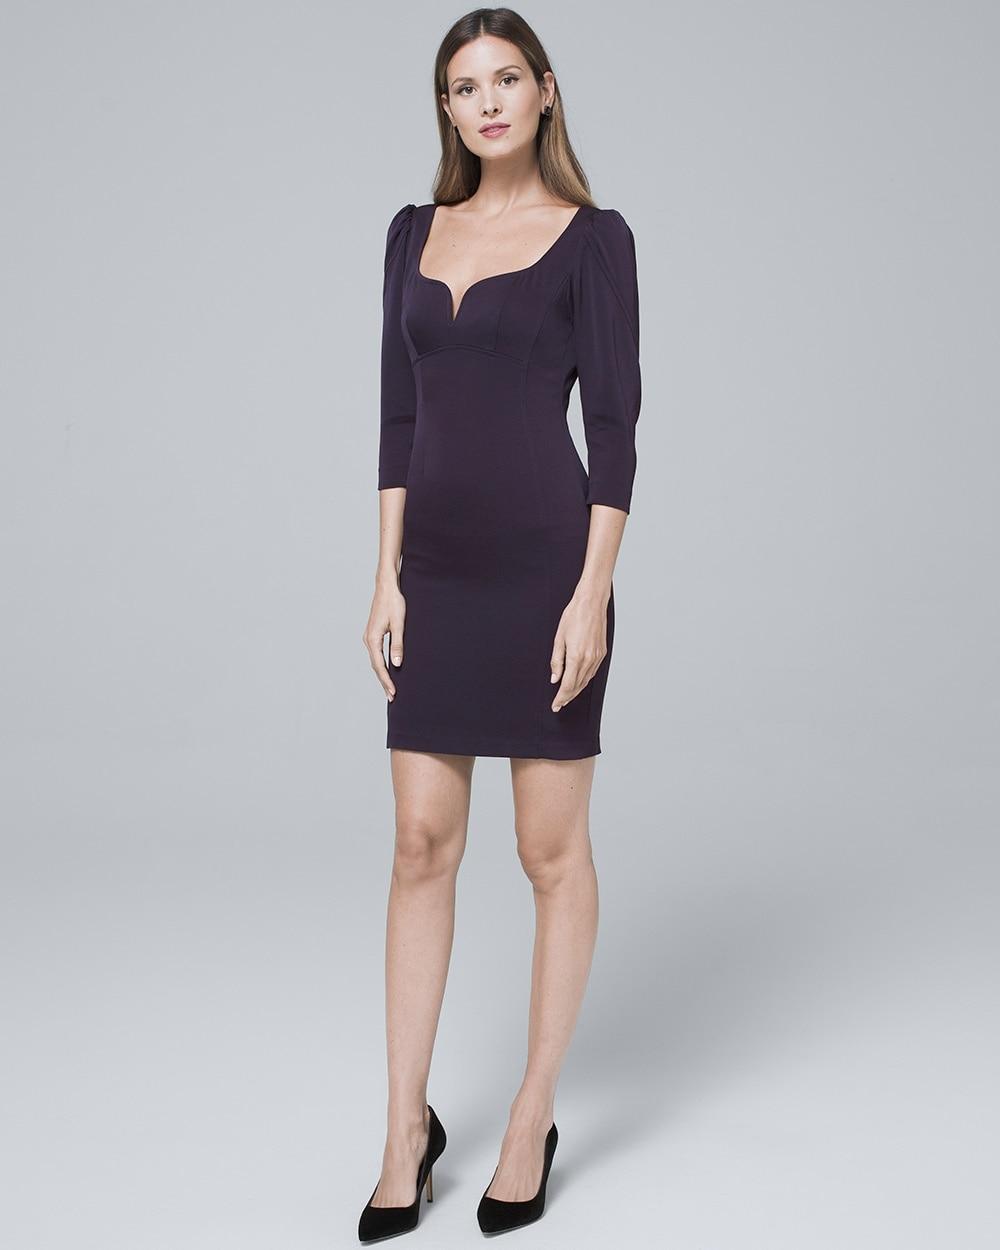 Plunge Neckline Sheath Dress White House Black Market